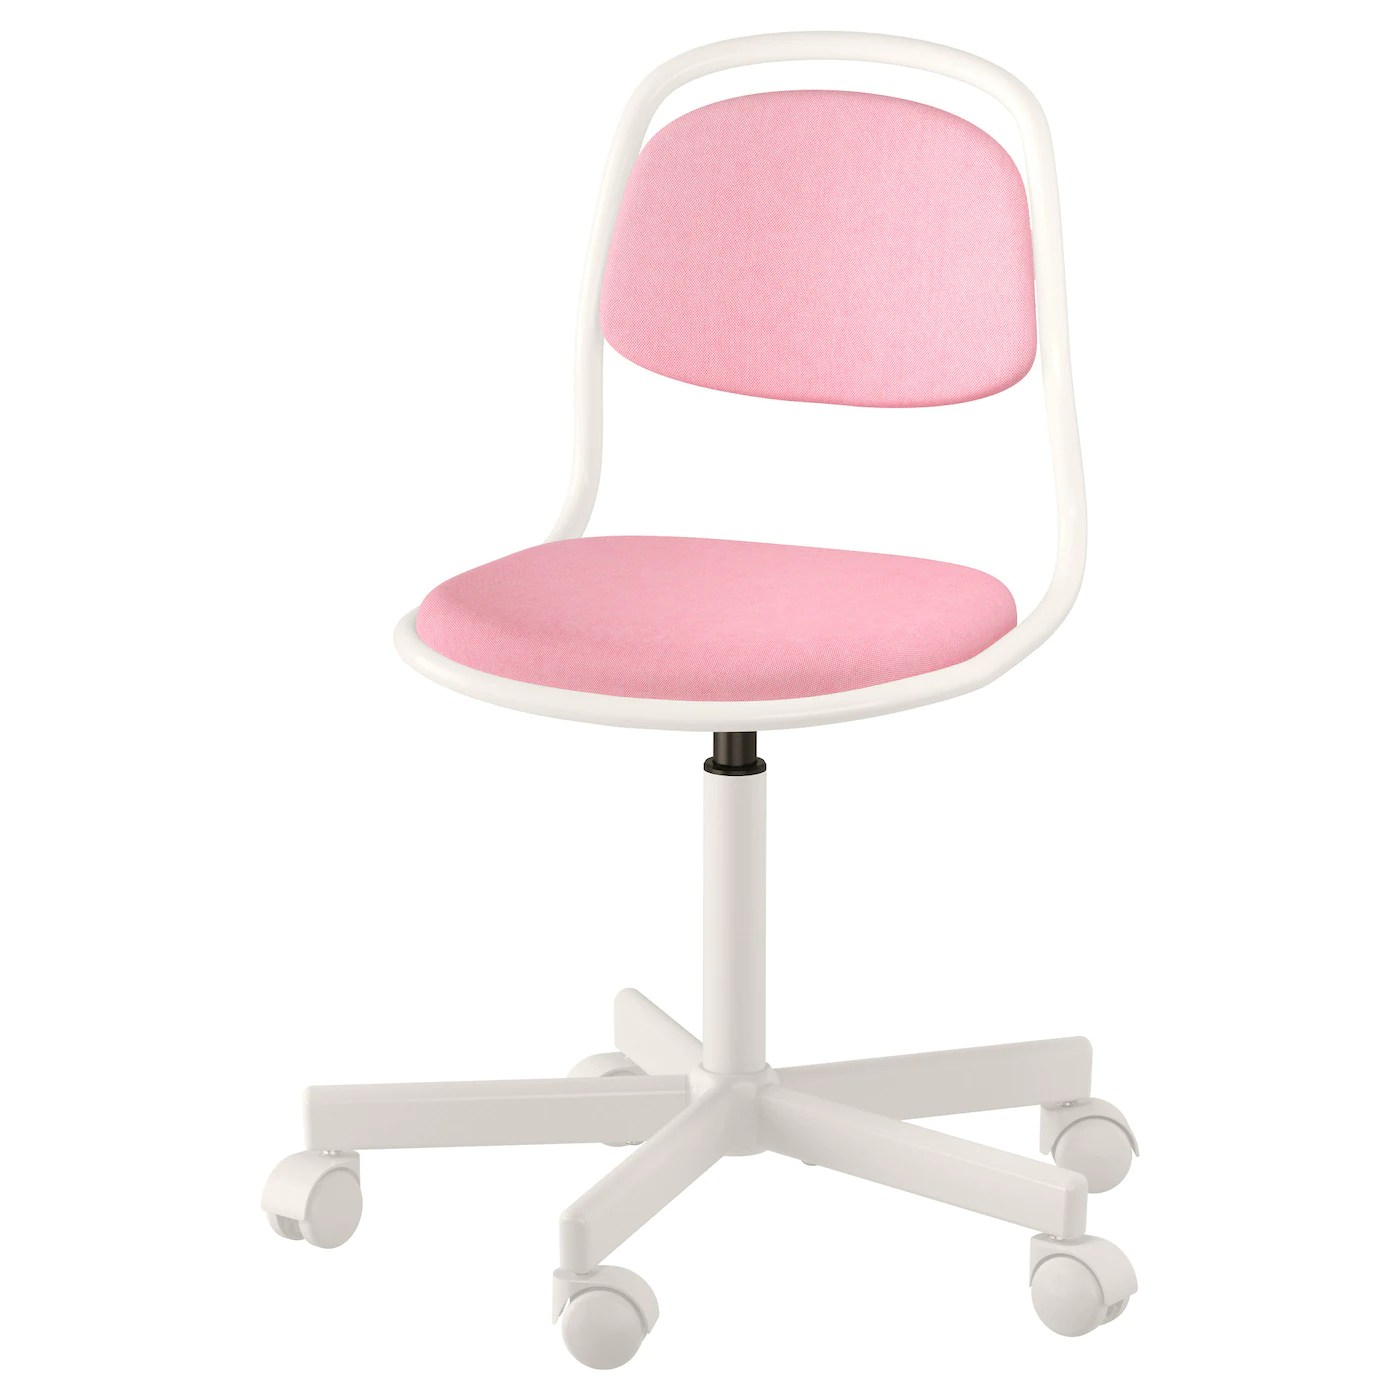 ikea pink desk chair bean bags chairs ÖrfjÄll children 39s white vissle